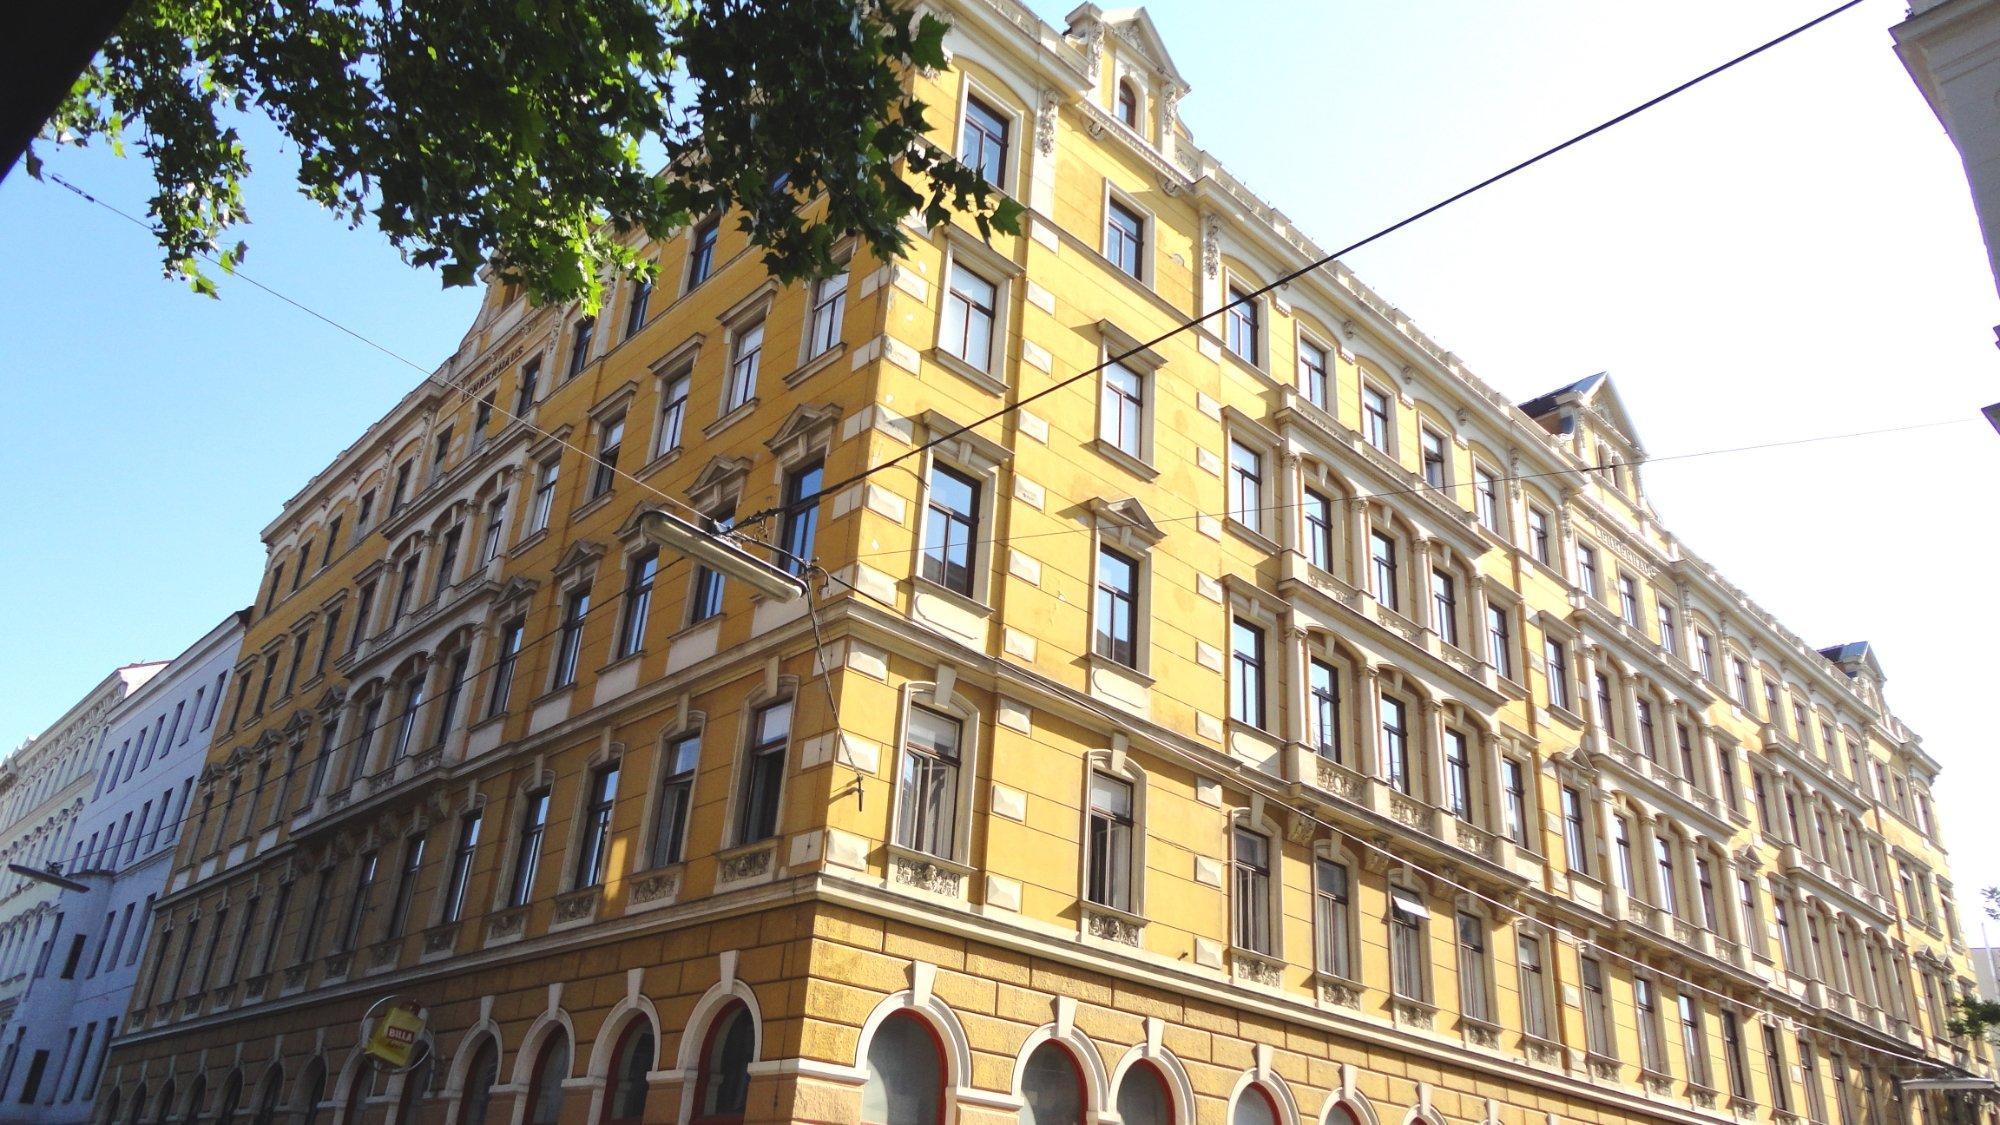 Hotel-Pension Lehrerhaus